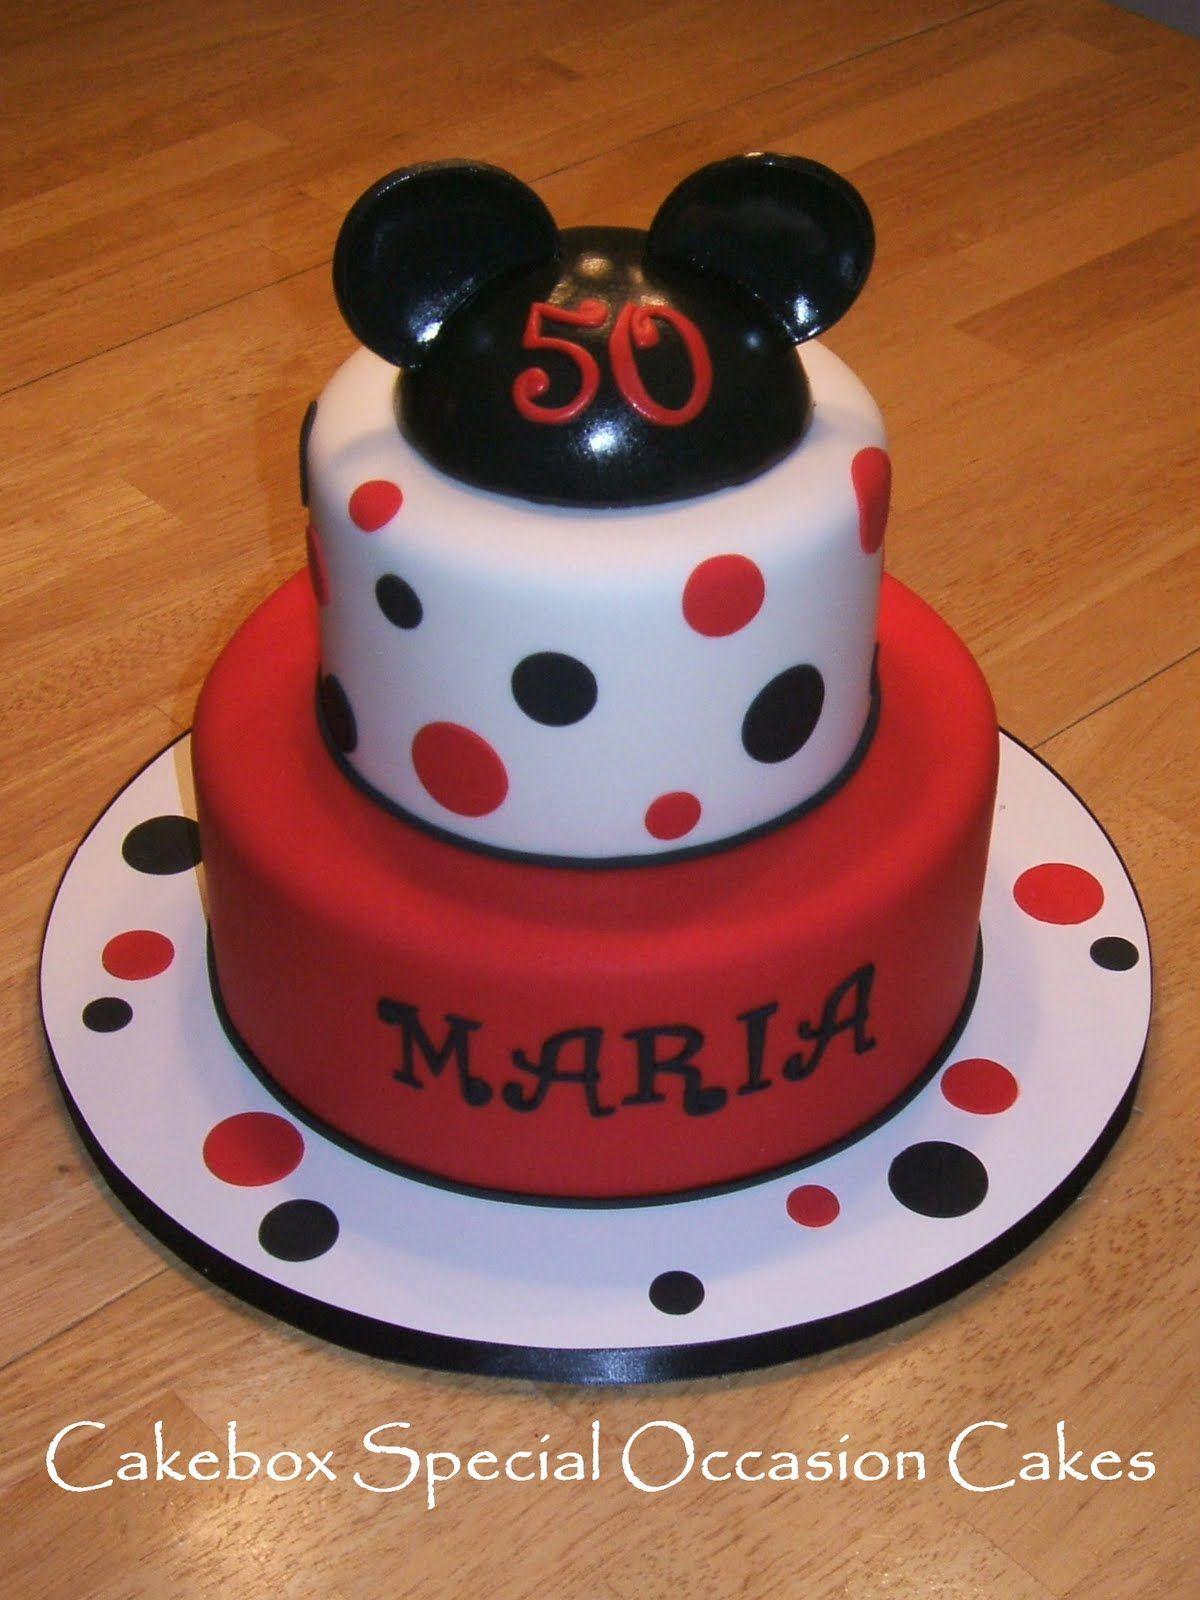 Cakebox December 2010 Funny birthday cakes, Cake